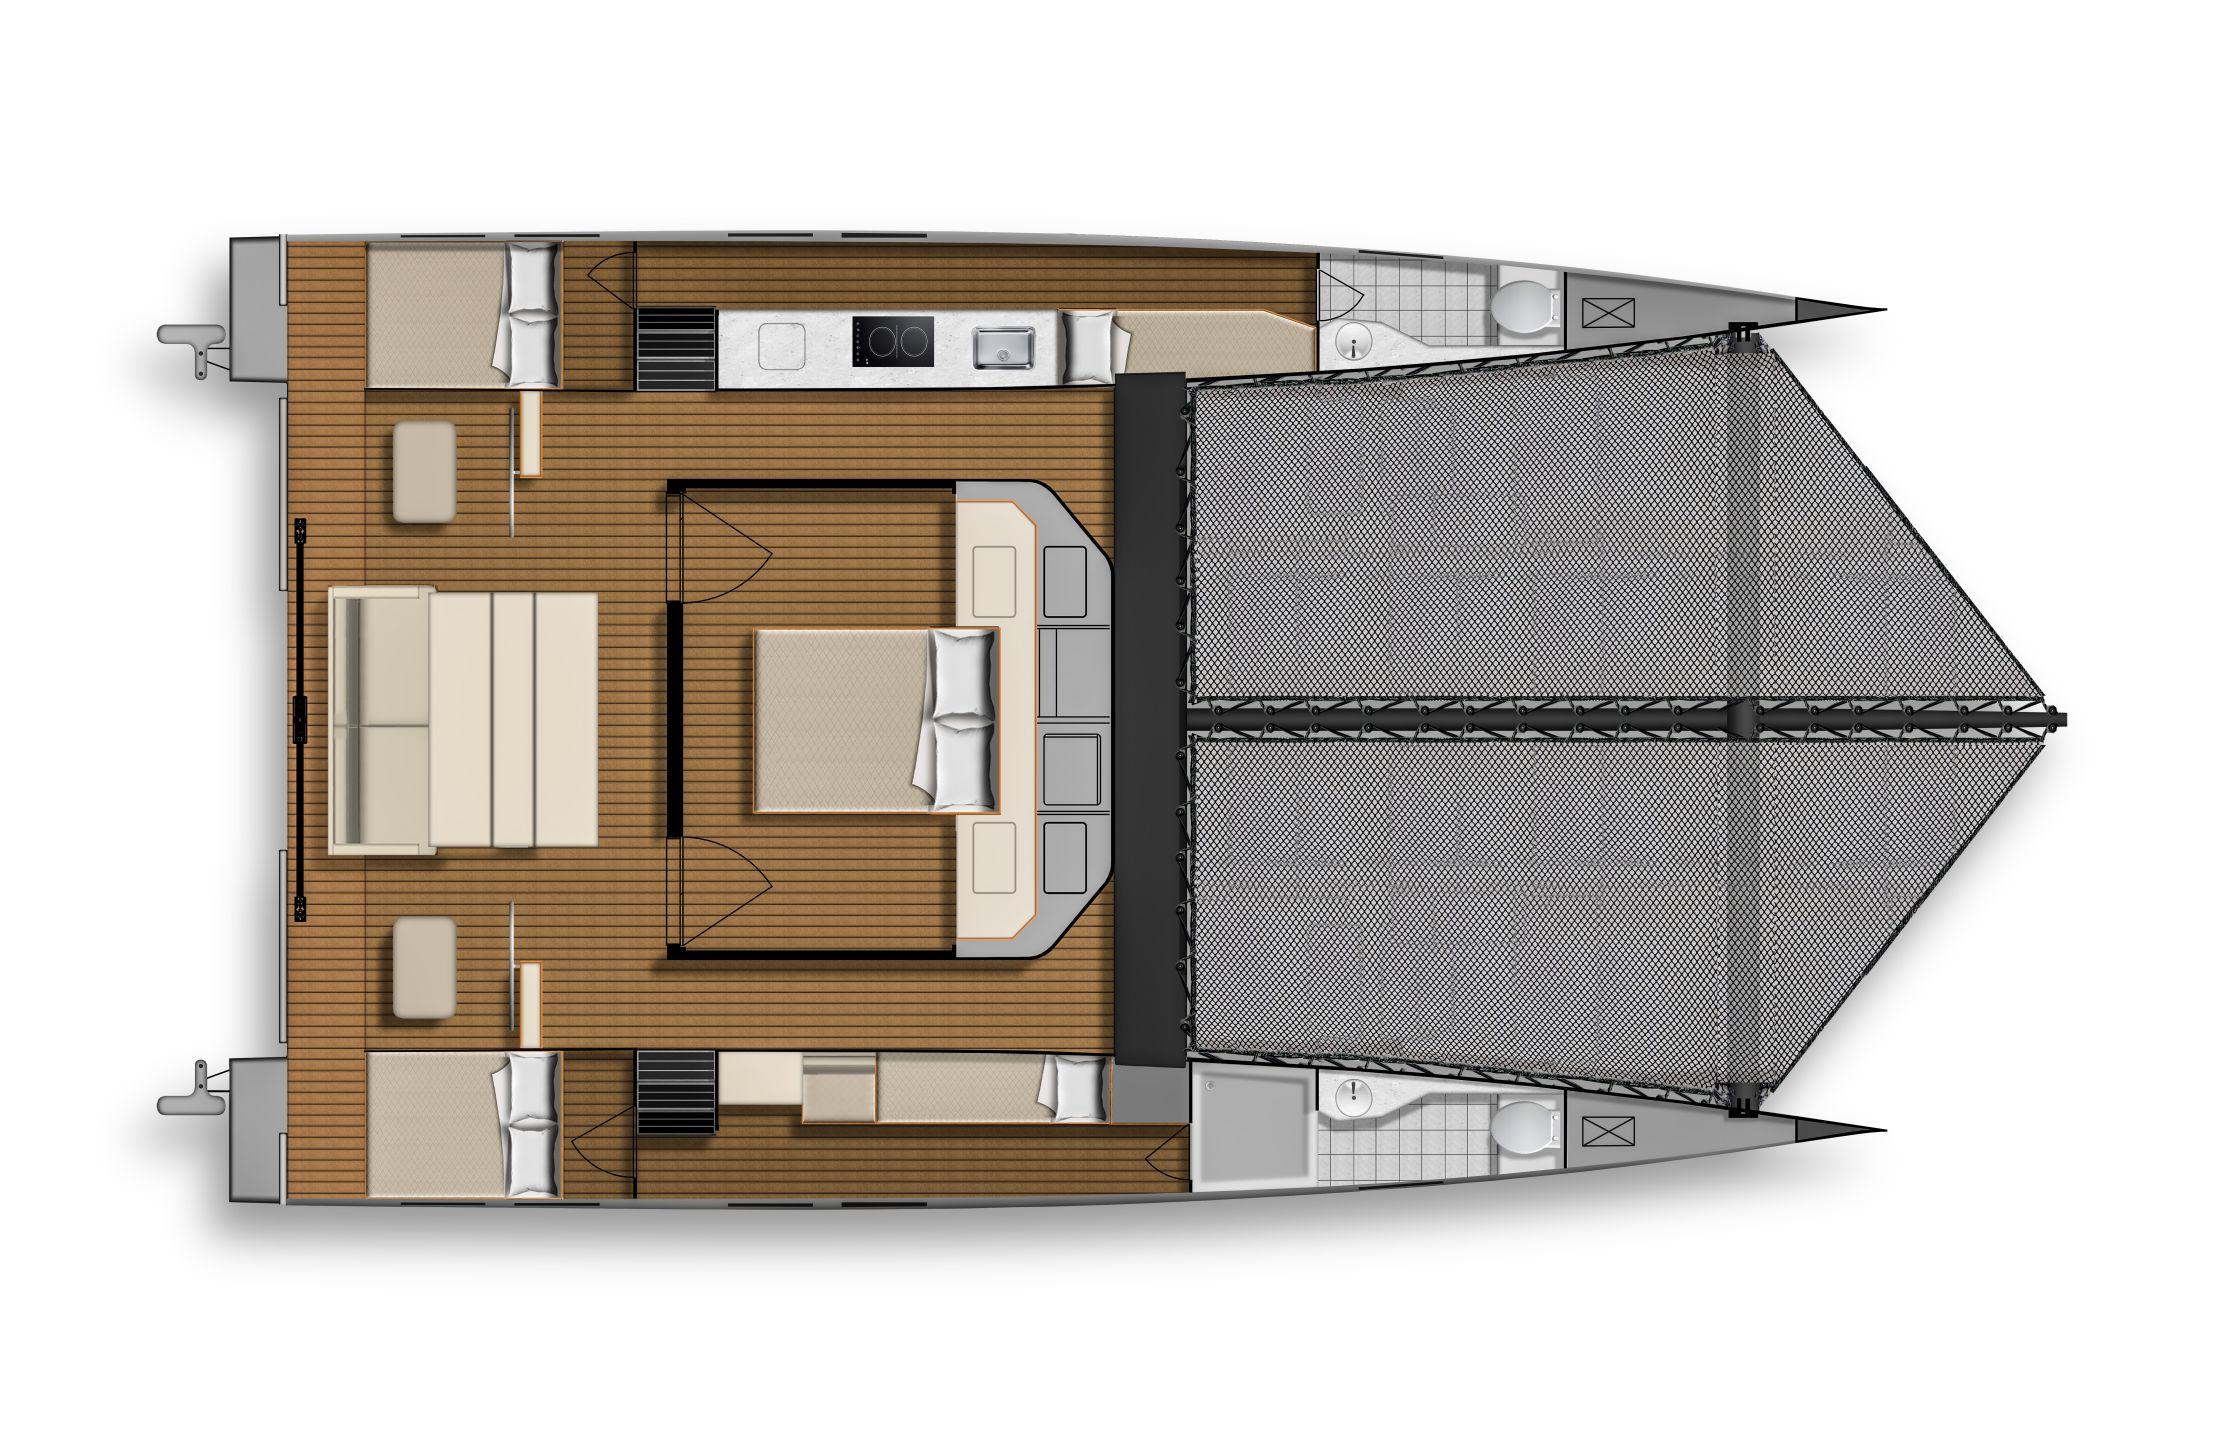 ESC40 Interior Layout Main Cabin Bed